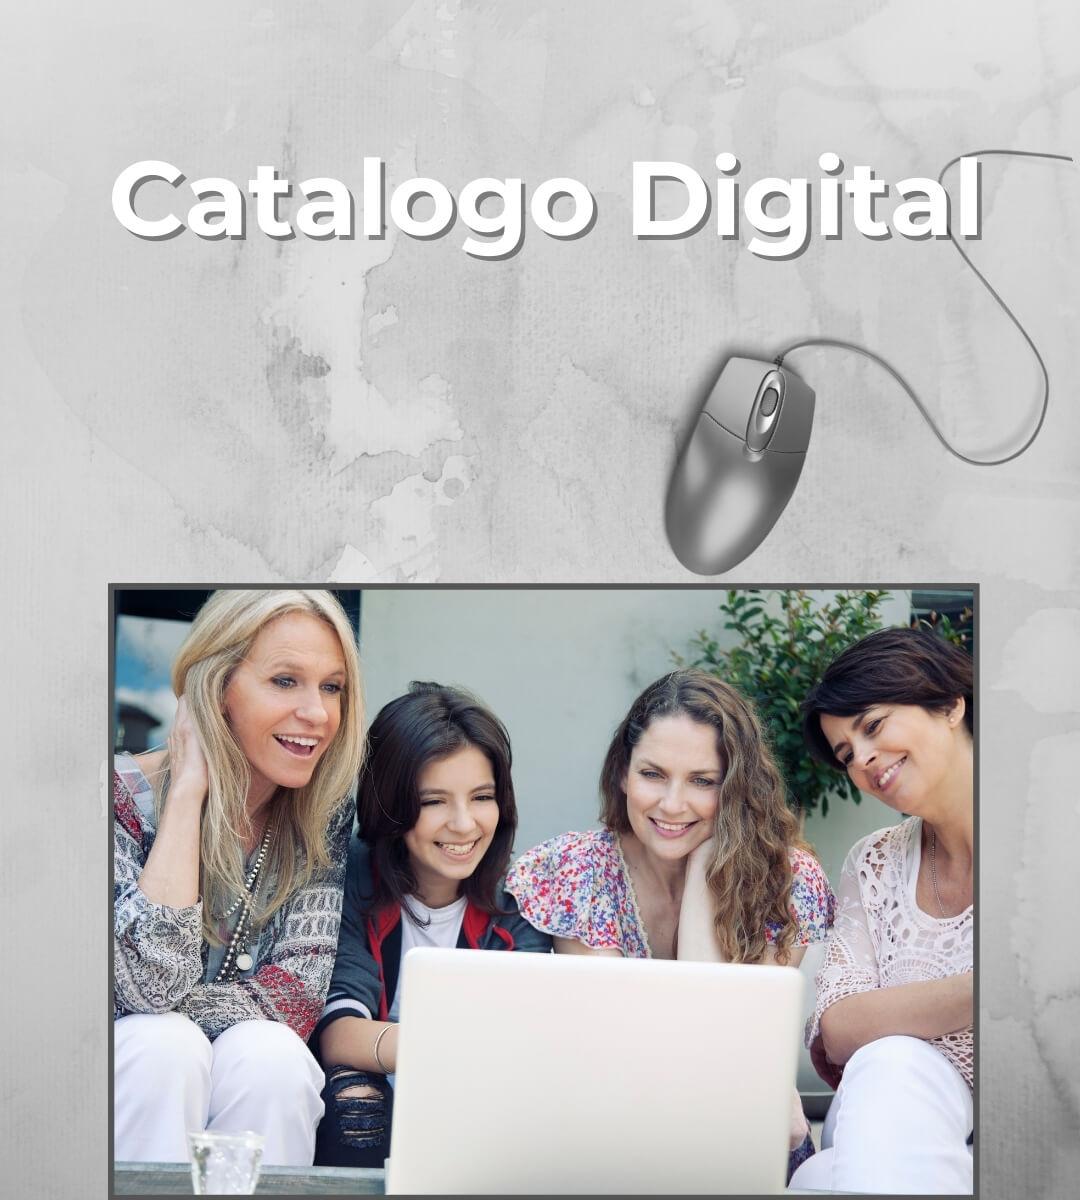 Catalogo digital de fajas